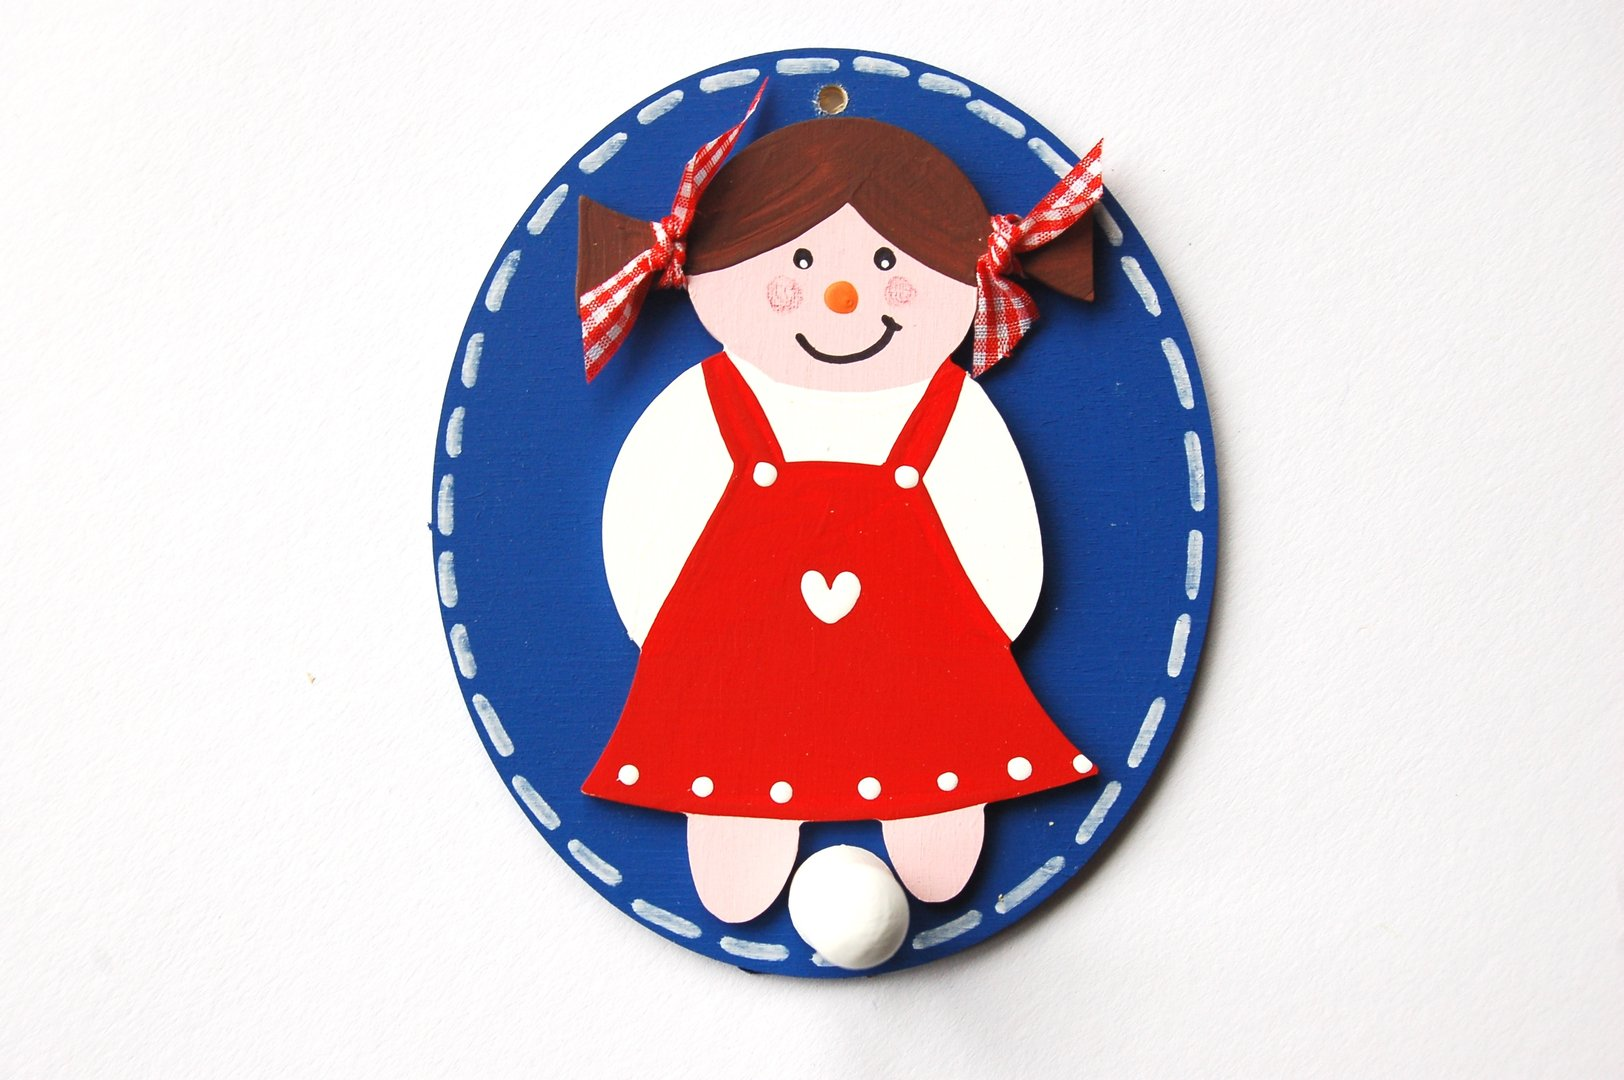 Kleiderhaken clipart  Kleiderhaken oval Mädchen - Holzlotte